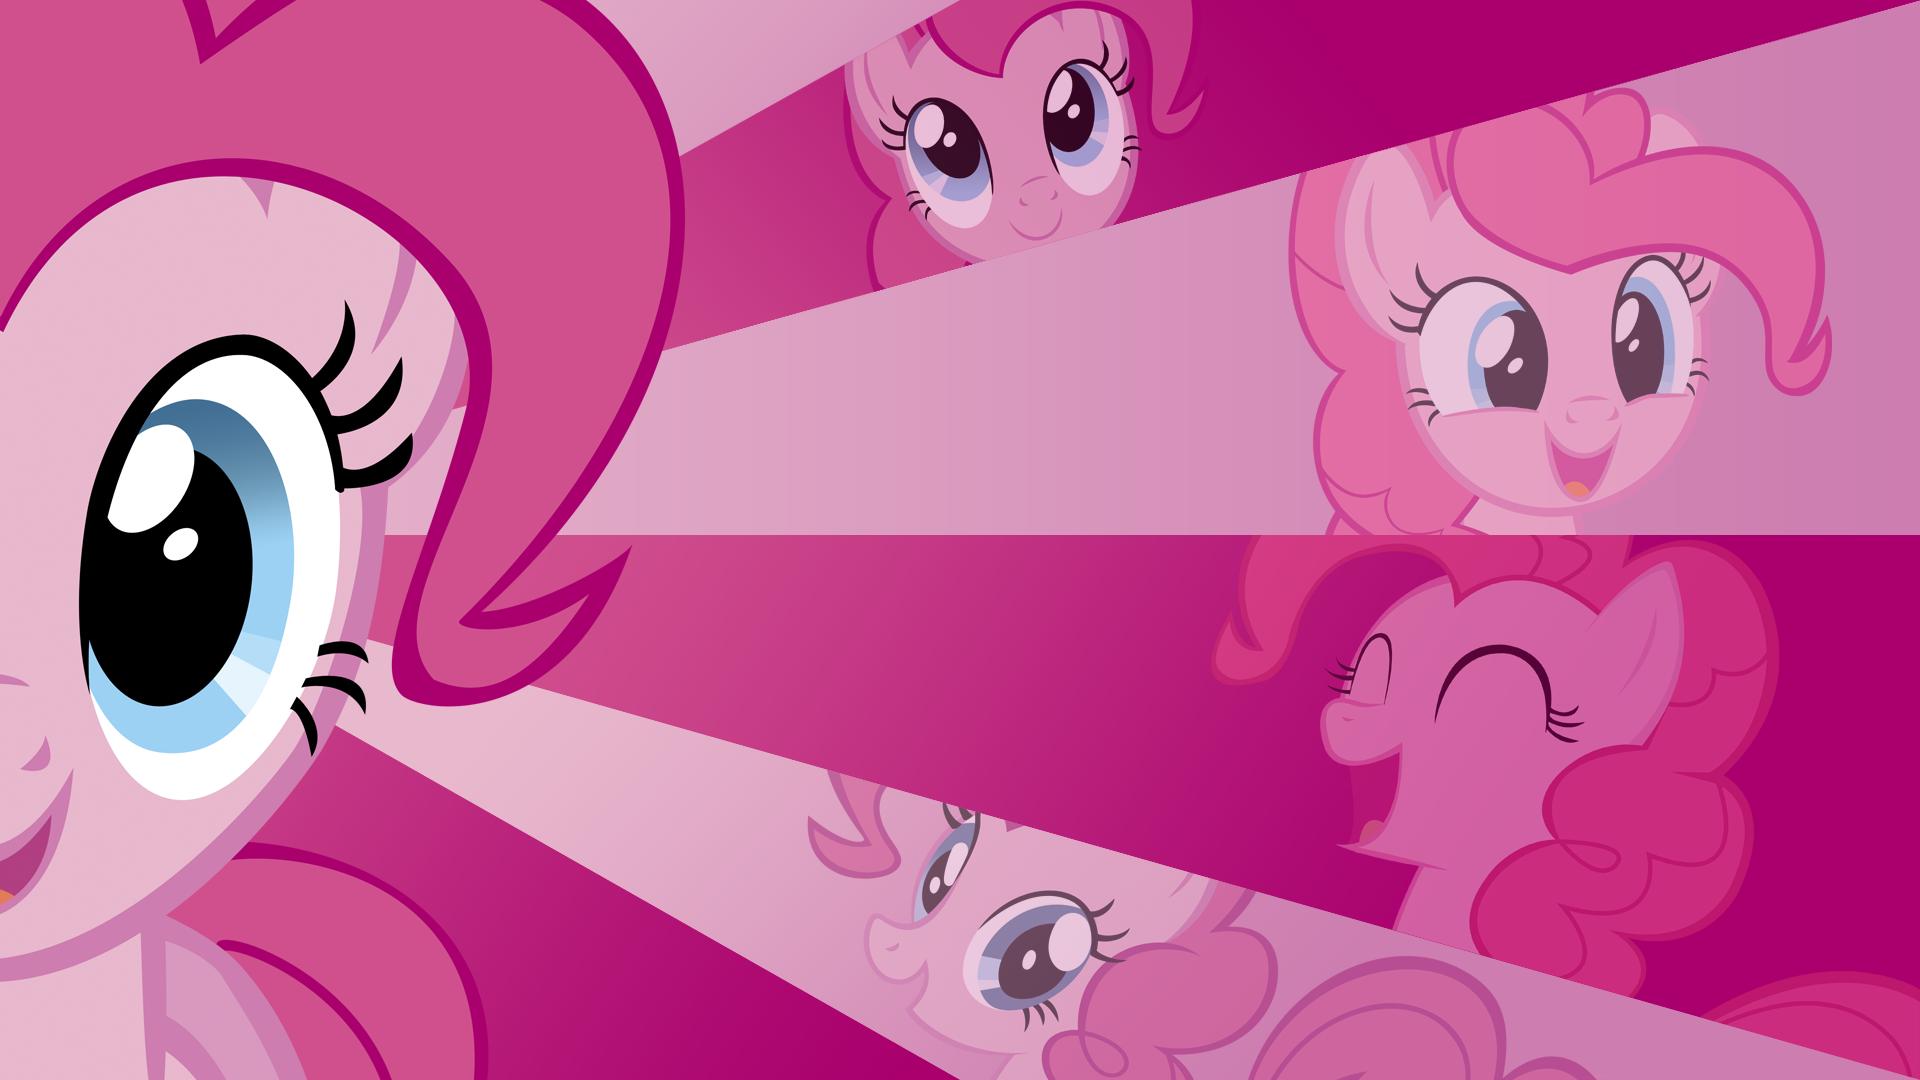 Pinkie Pie Wallpaper by BlueDragonHans, Mihaaaa, Orschmann, Peachspices and Tigersoul96